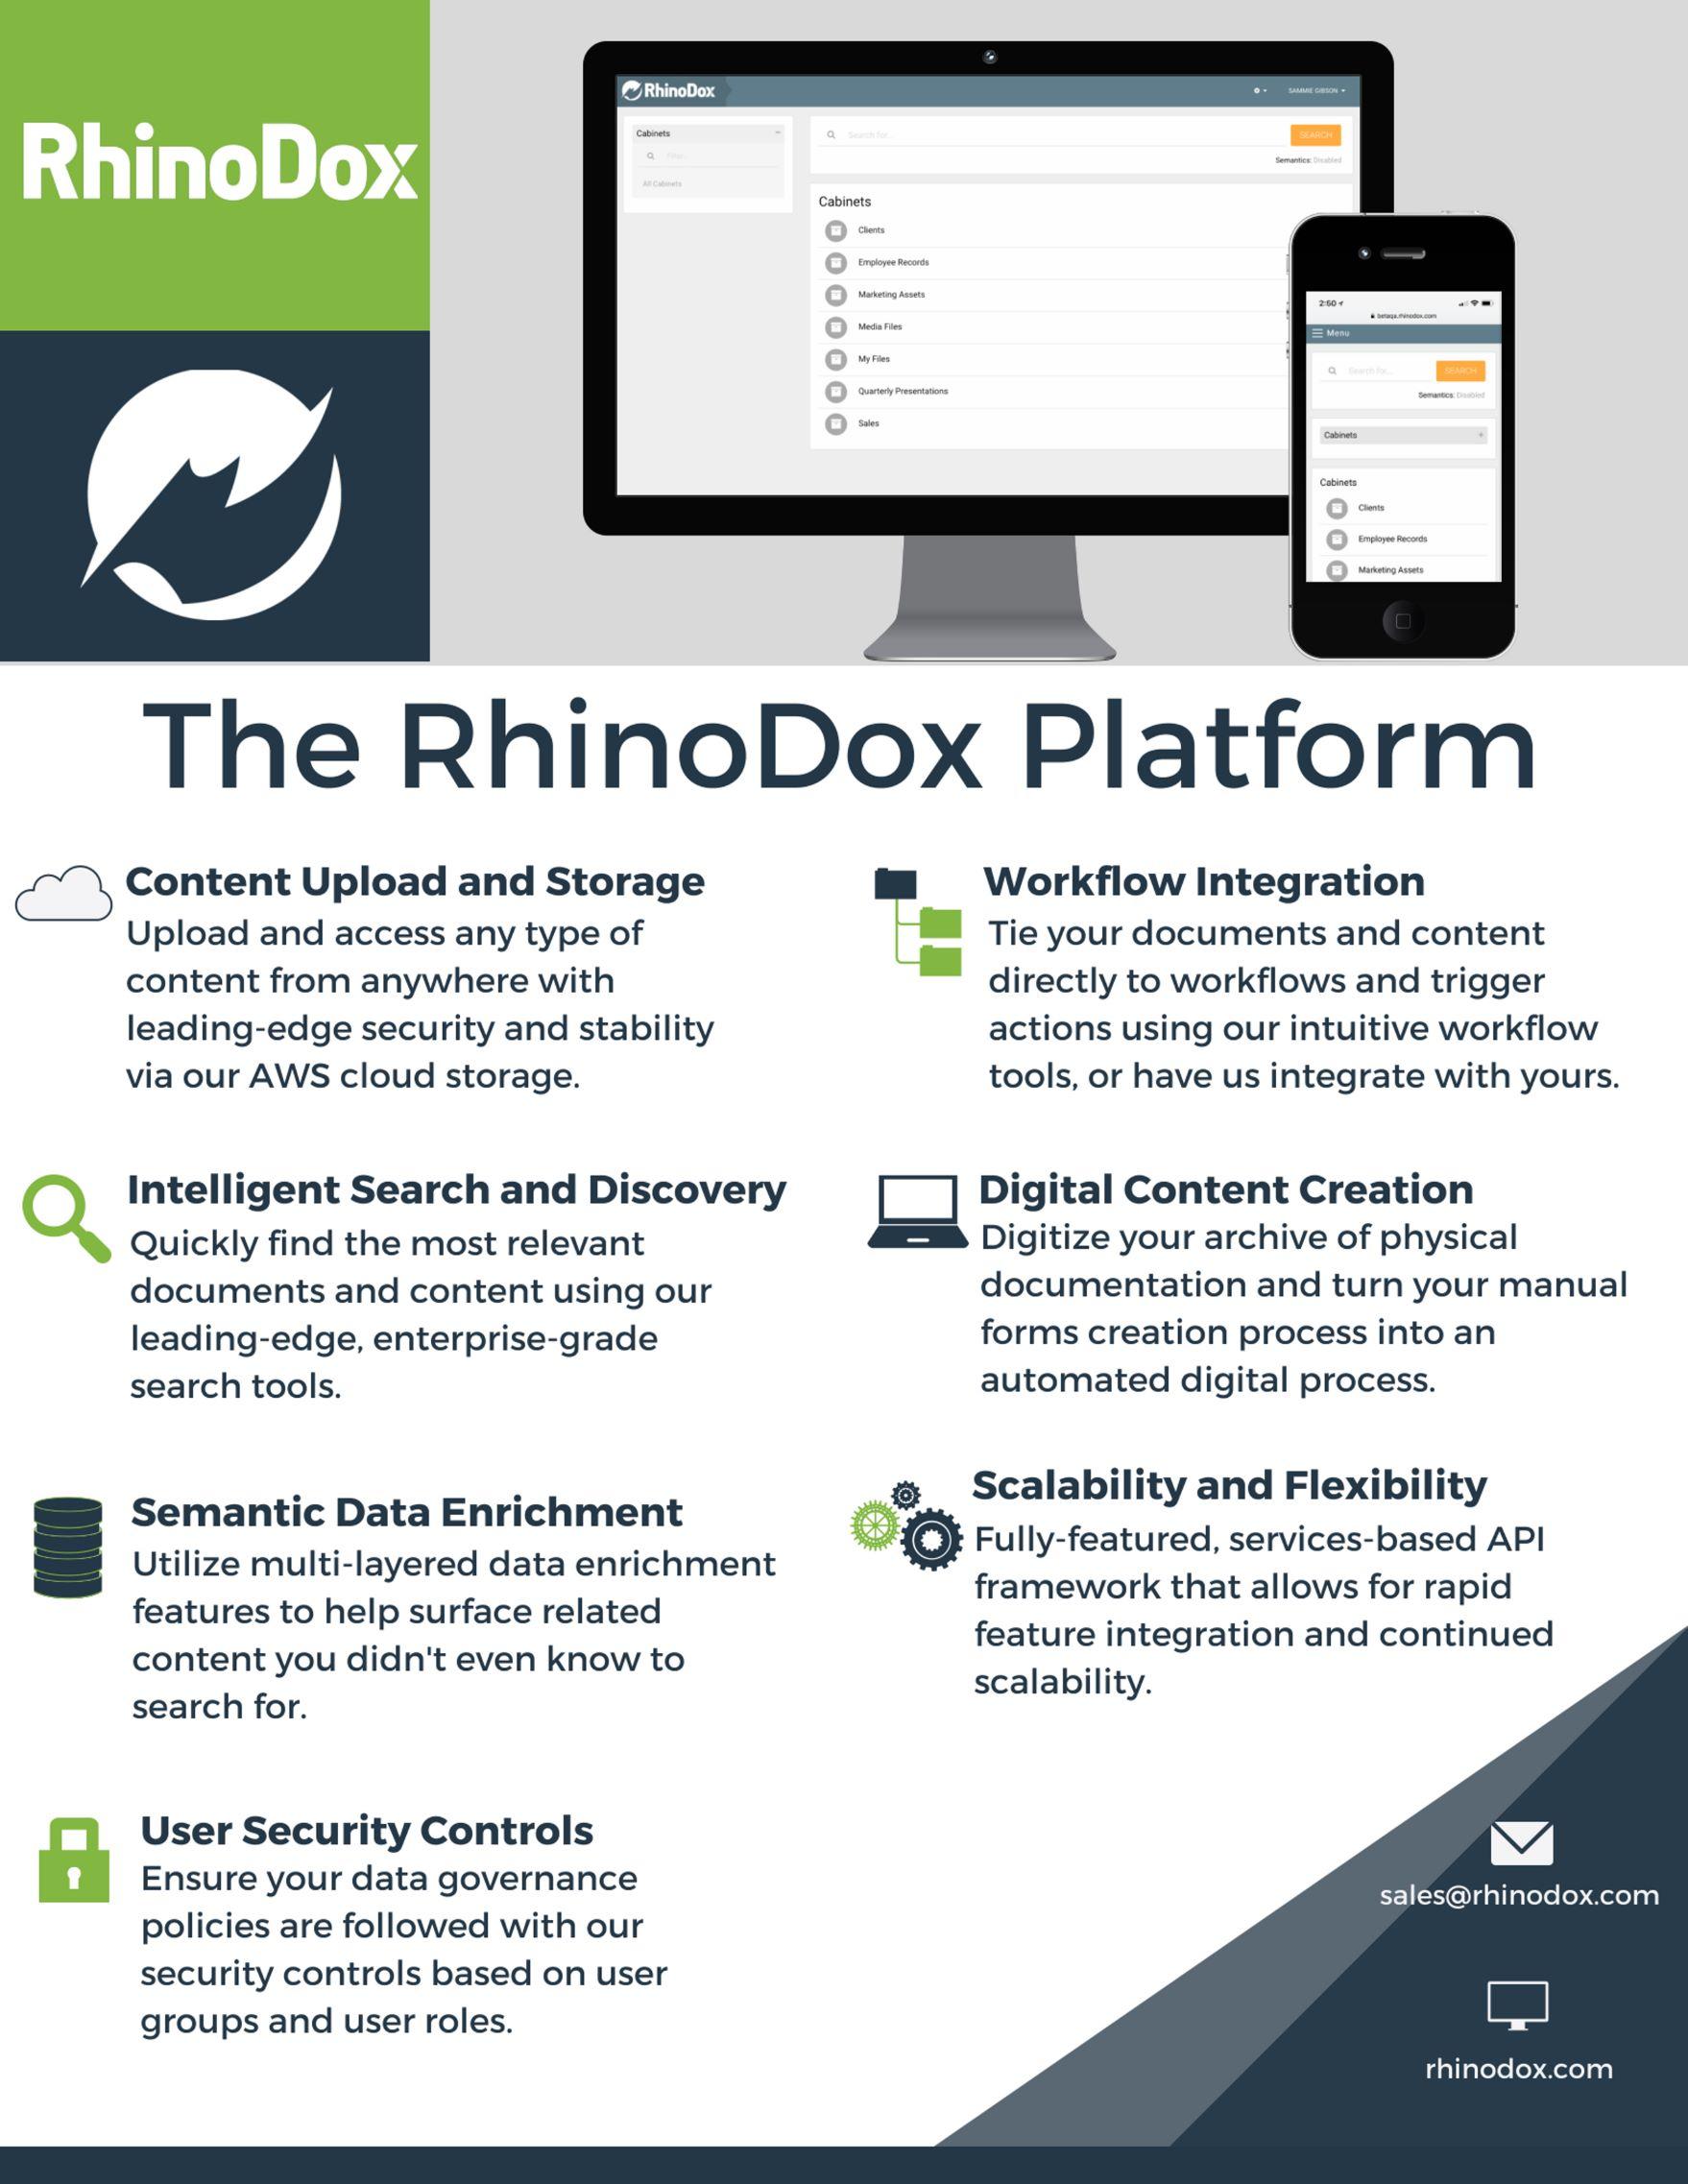 The RhinoDox Platform